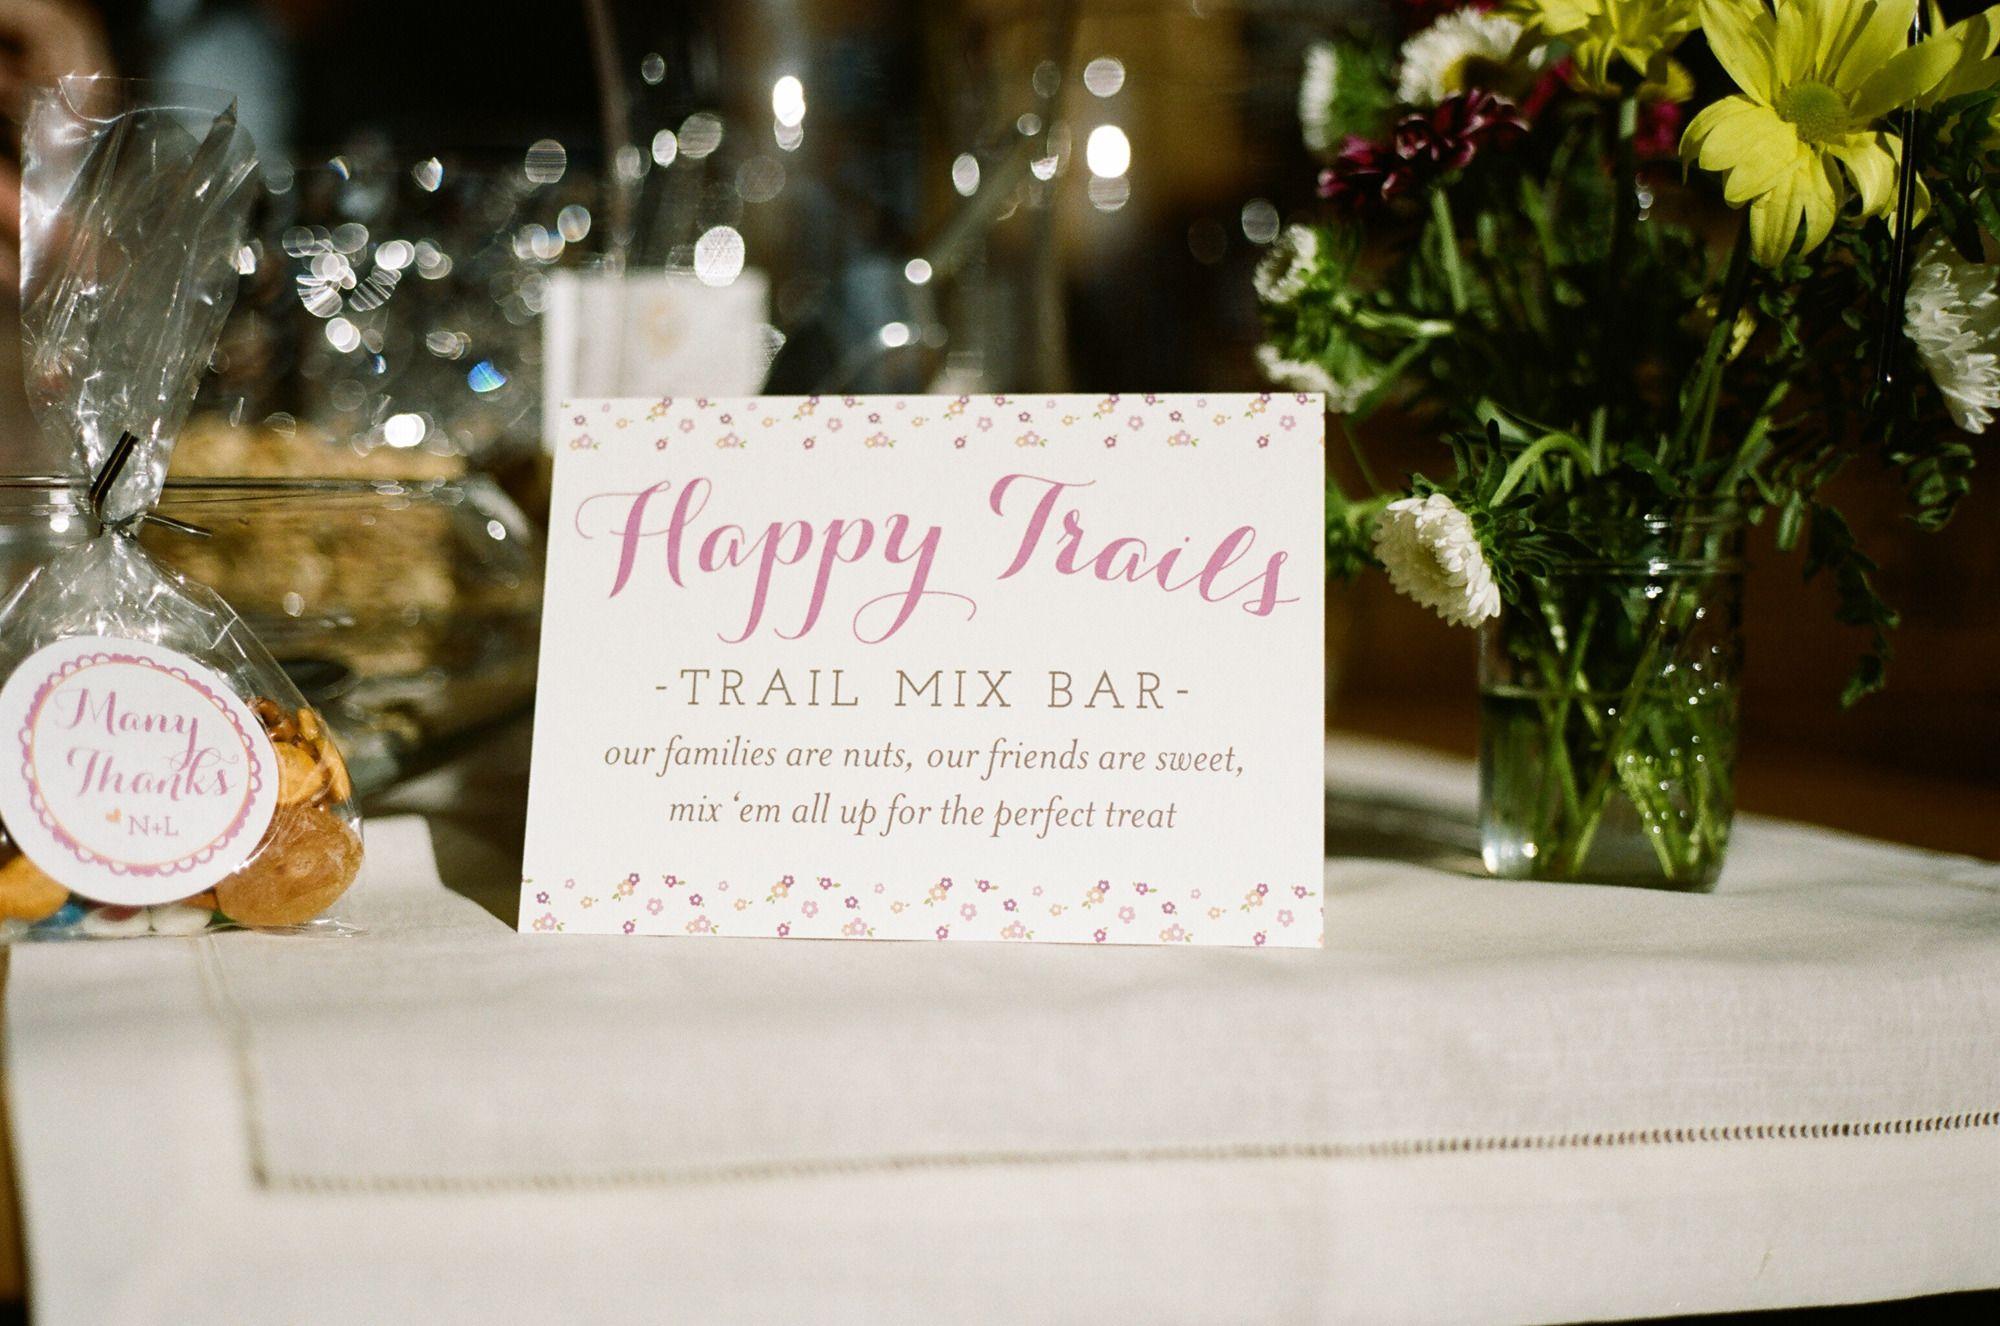 Northstar Zephyr Lodge Wedding   Trail mix bars, Lodge wedding and ...